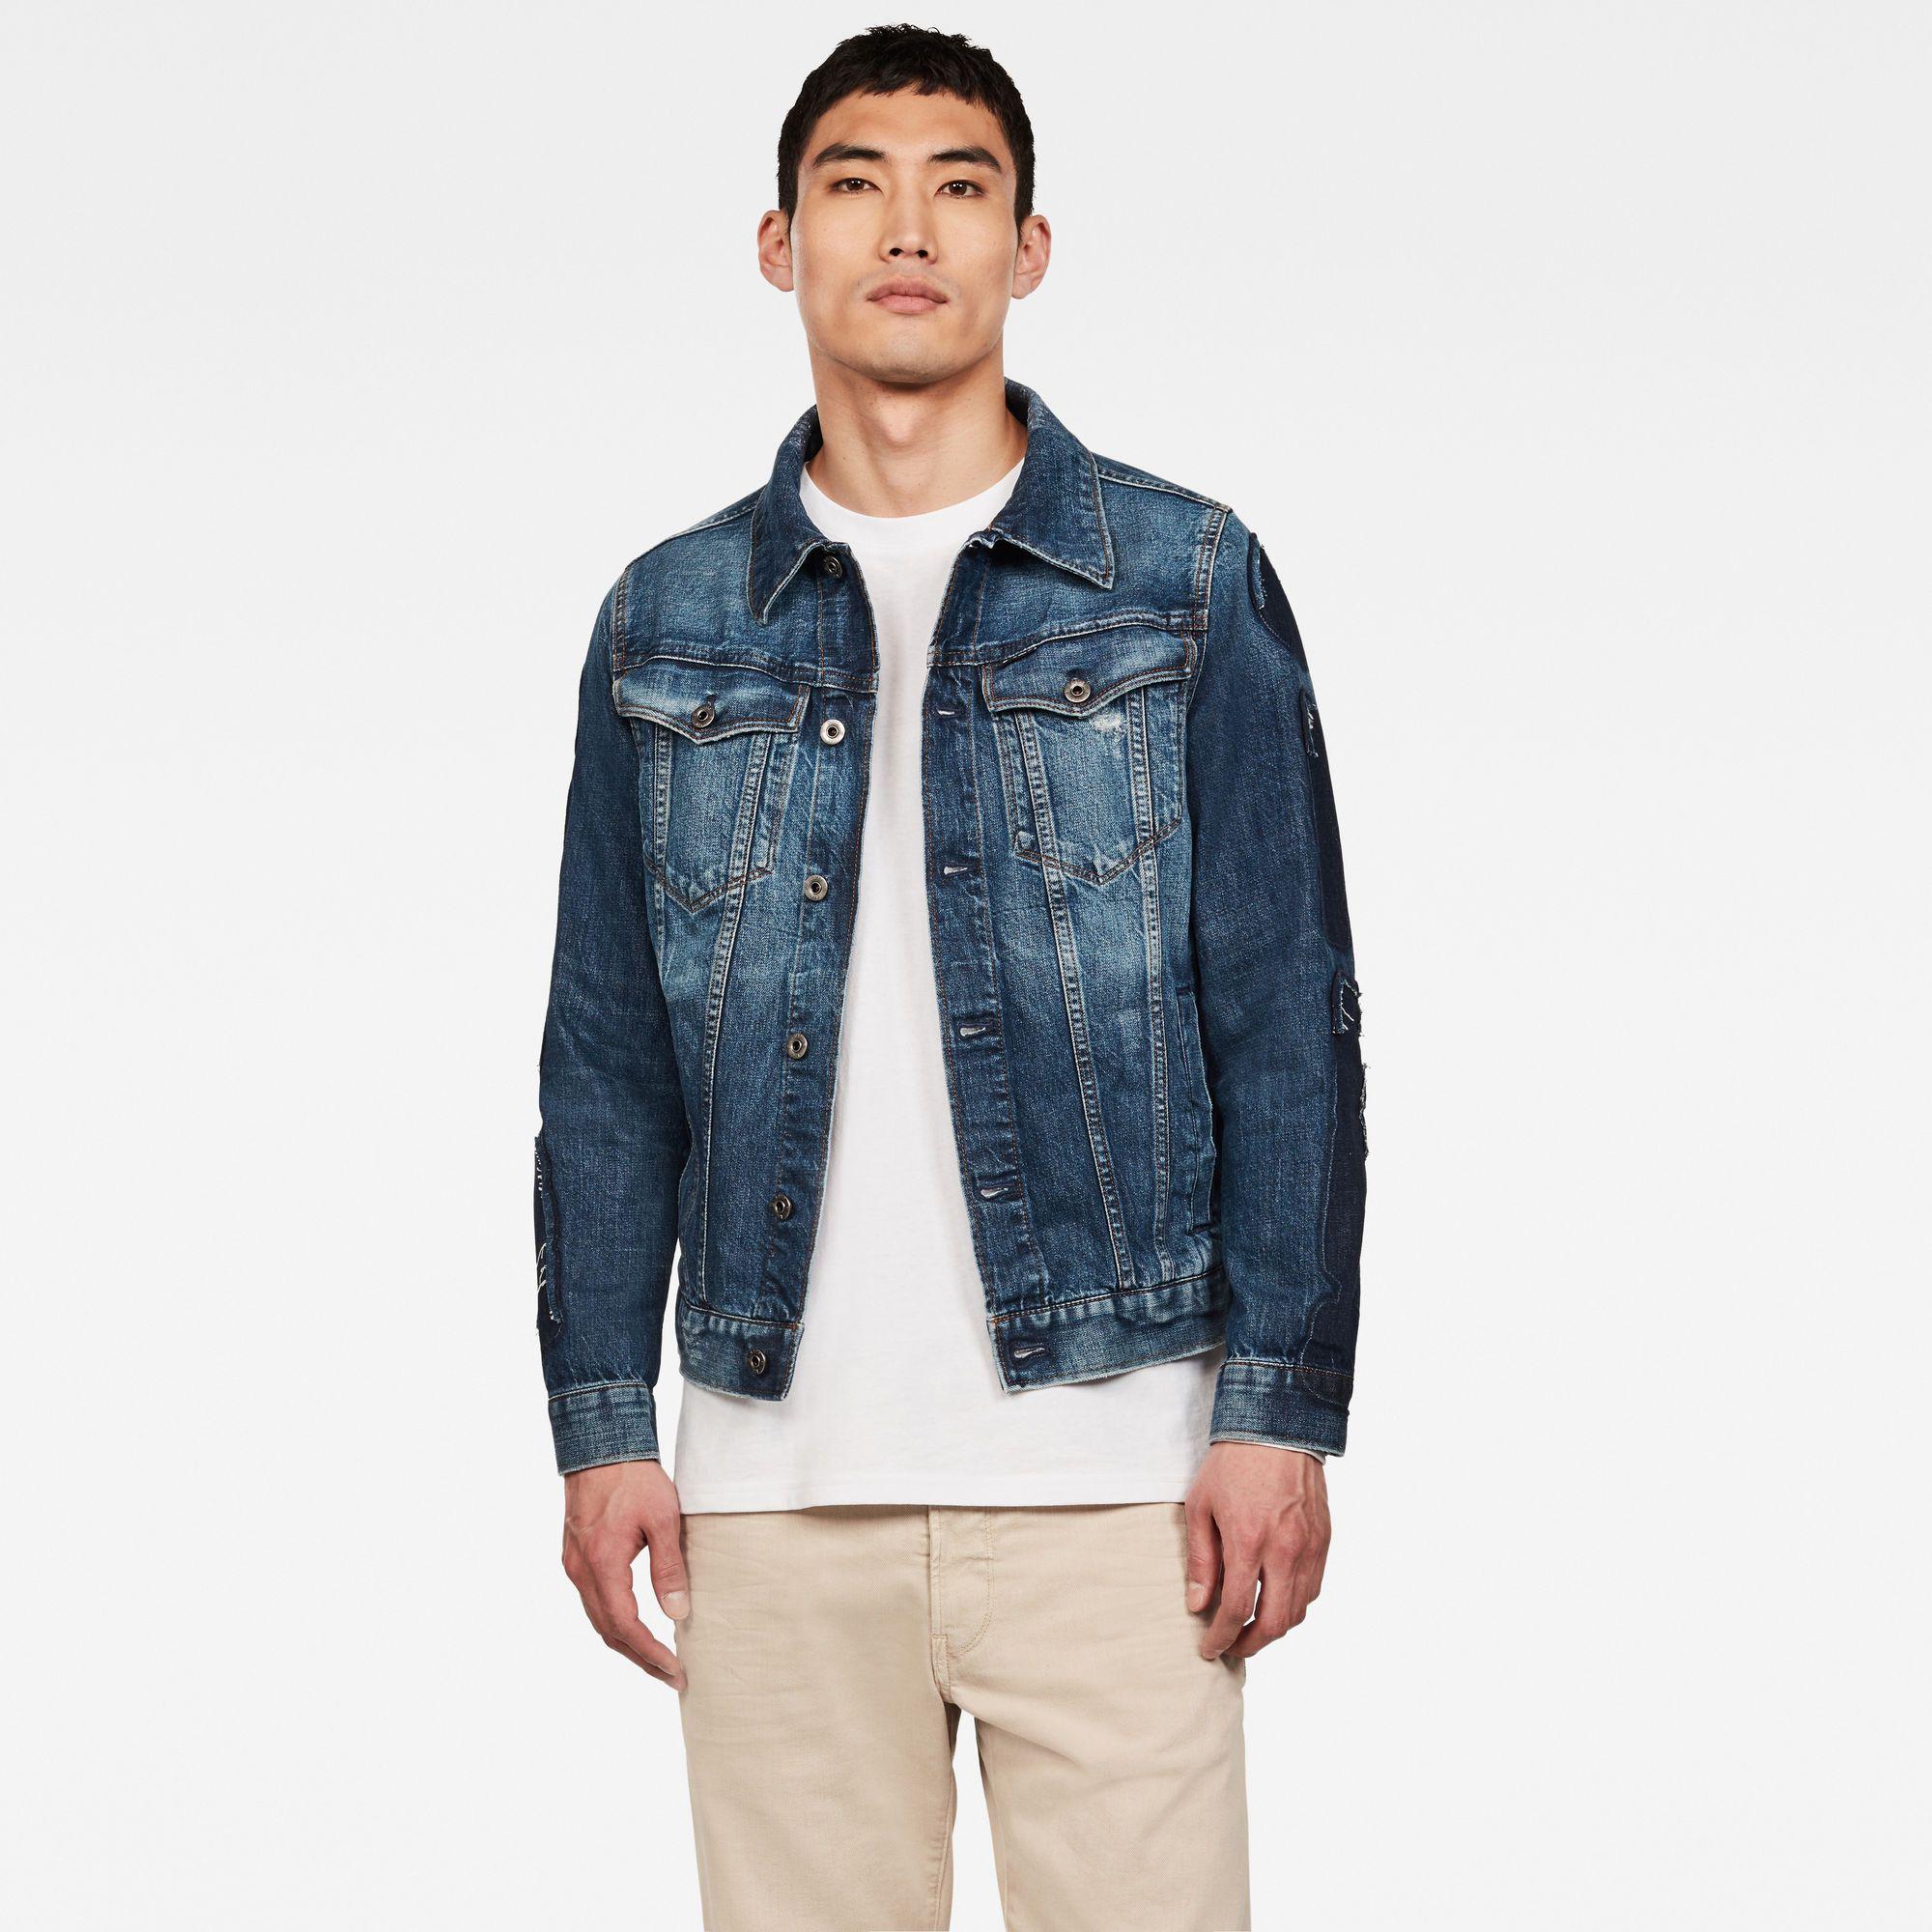 3301 Badges Slim Jacket Medium Aged Badges G Star Raw In 2021 G Star Denim Fashion Denim Fabric